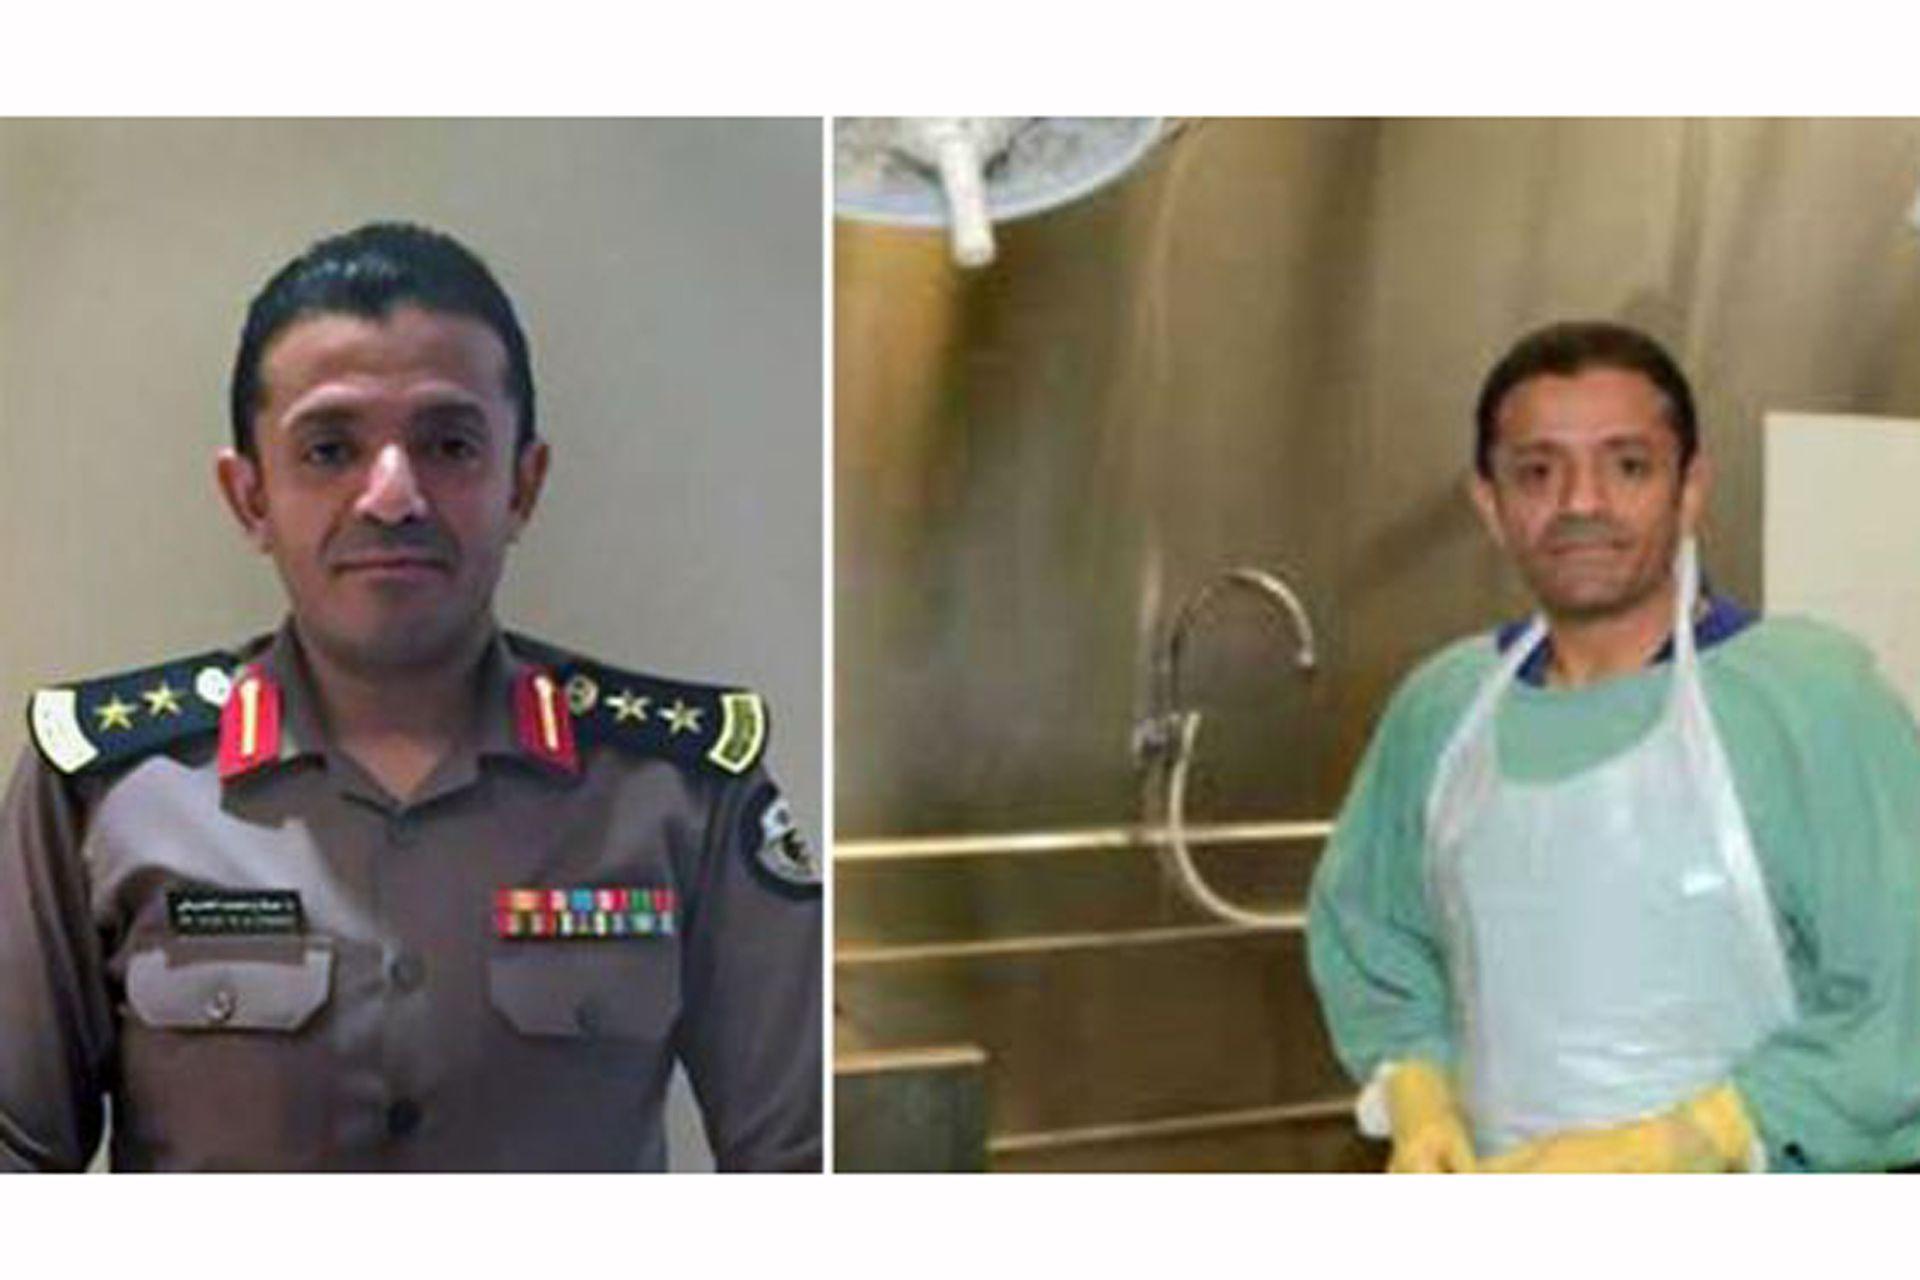 El patólogo forense Salah al Tubaigy viajó a Estambul el día de la muerte de Khashoggi